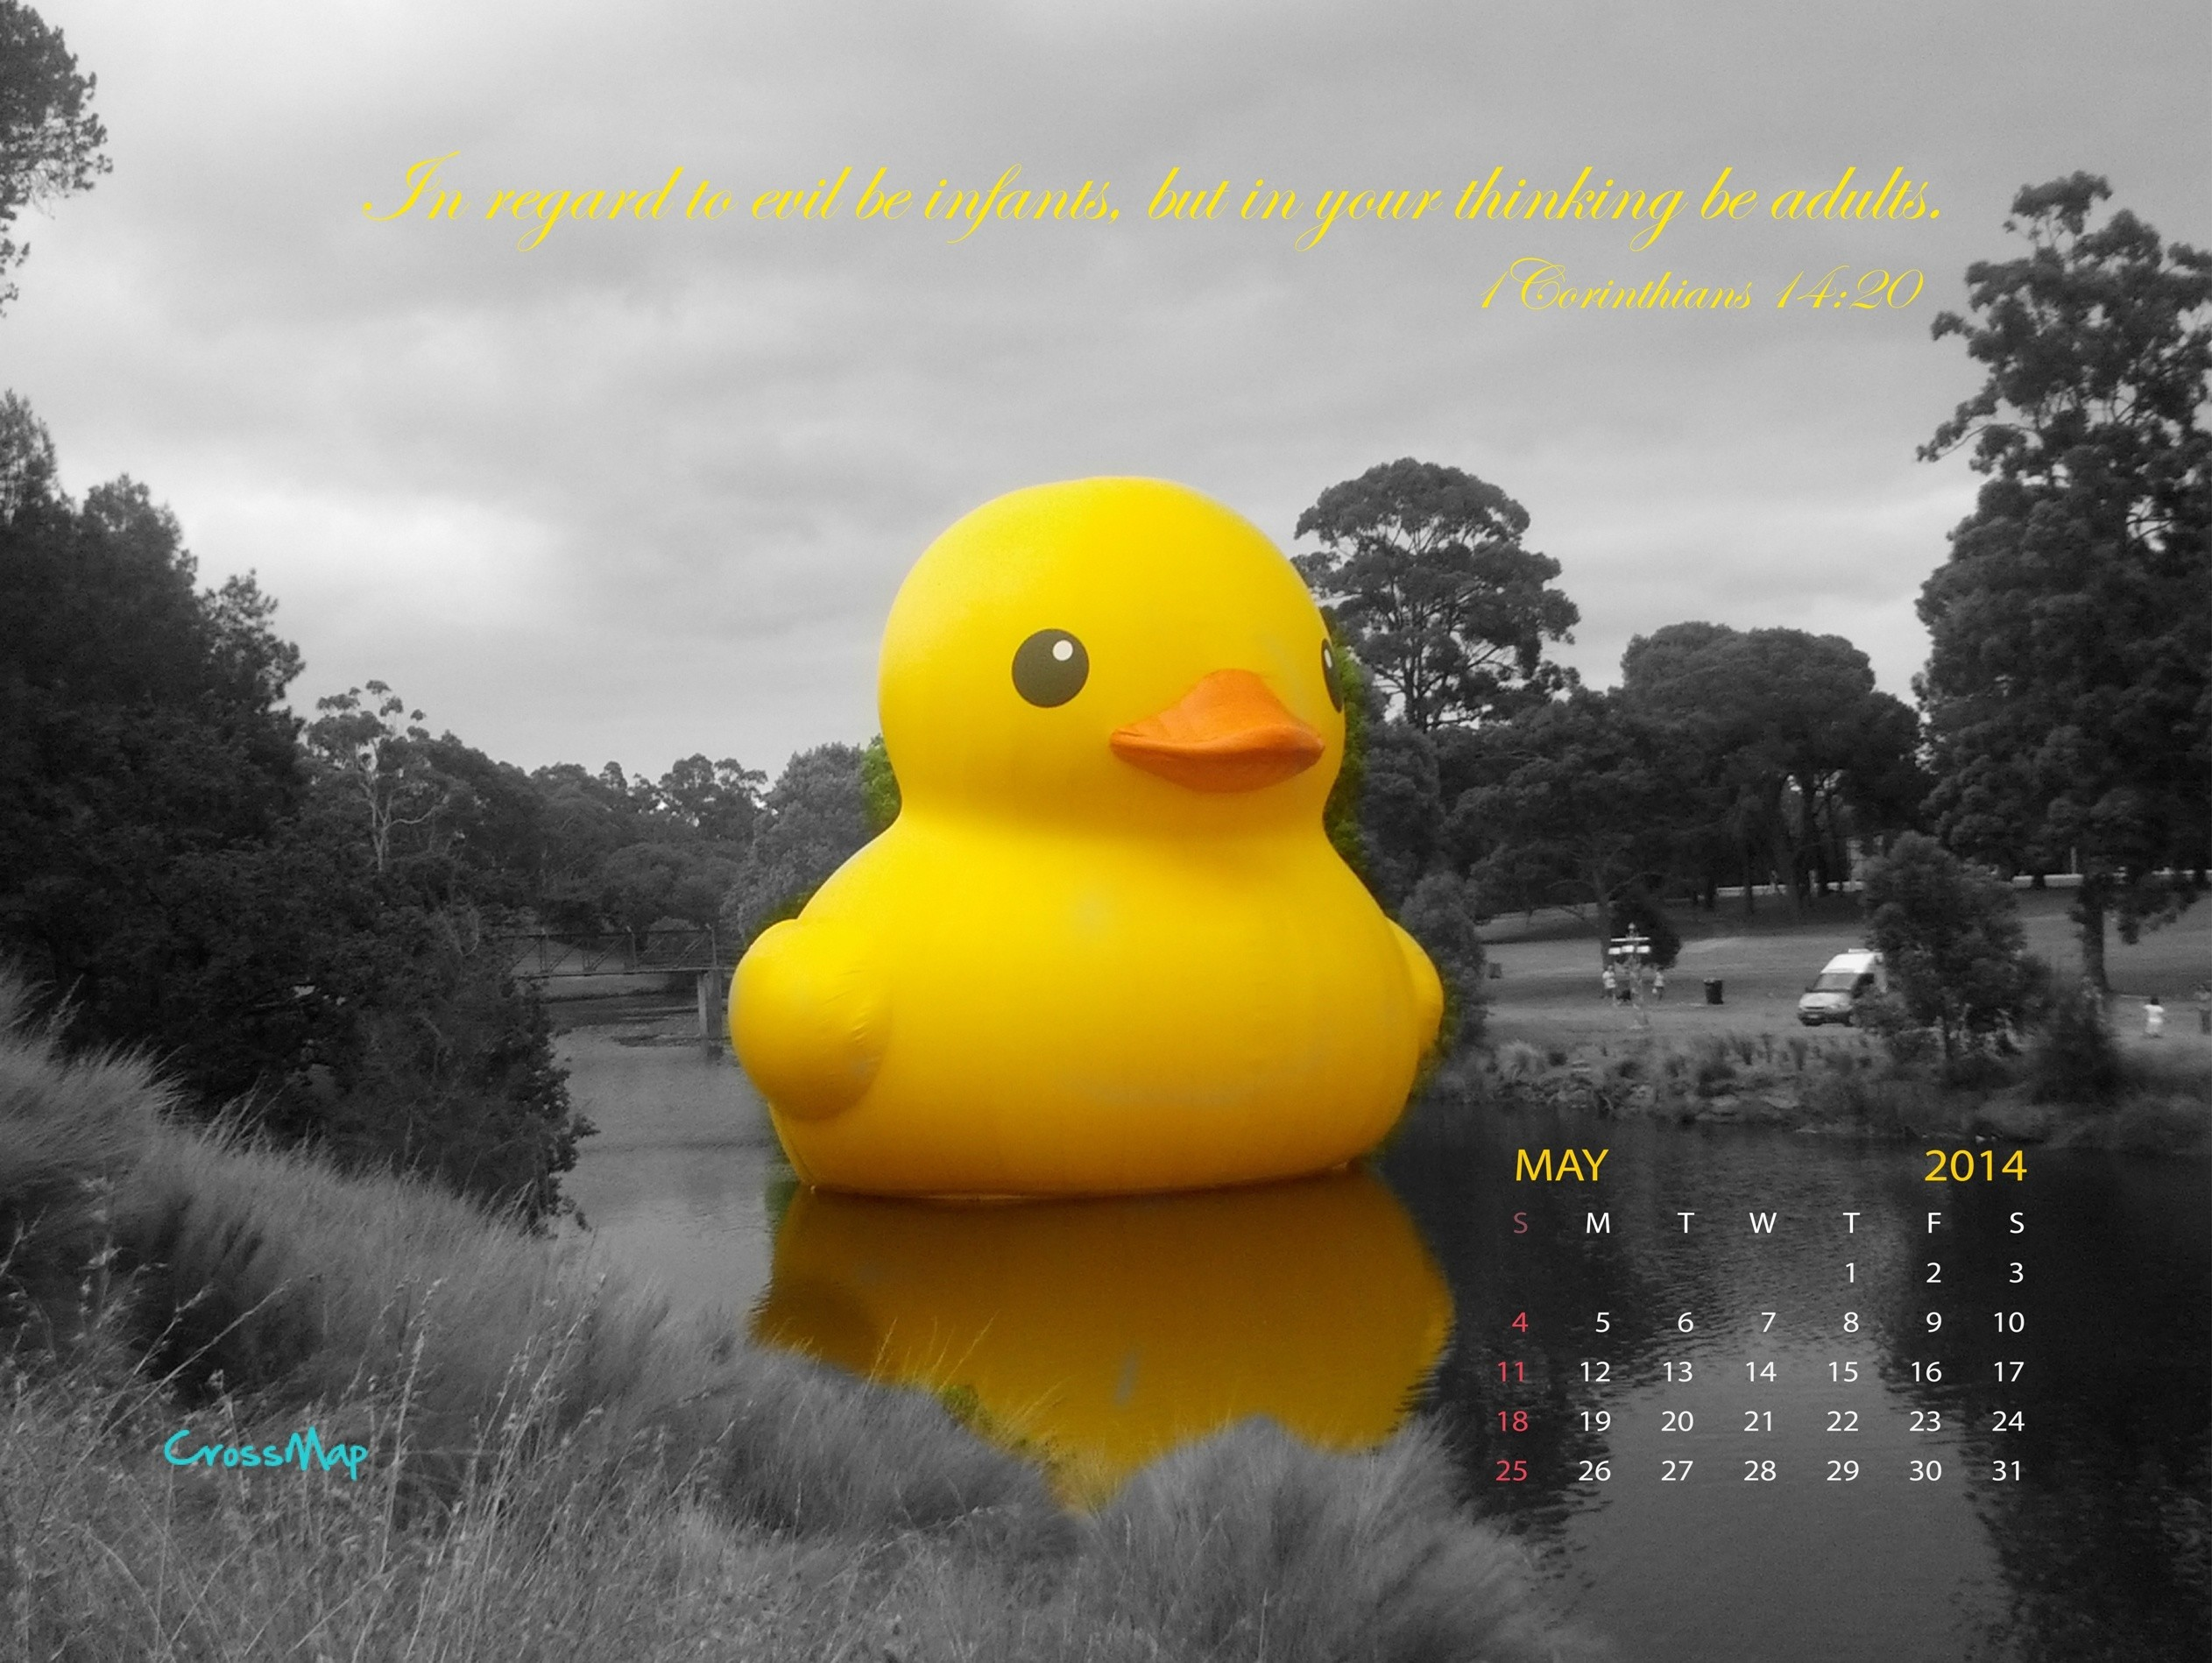 Rubber Duck Wallpaper 56 images 2525x1898